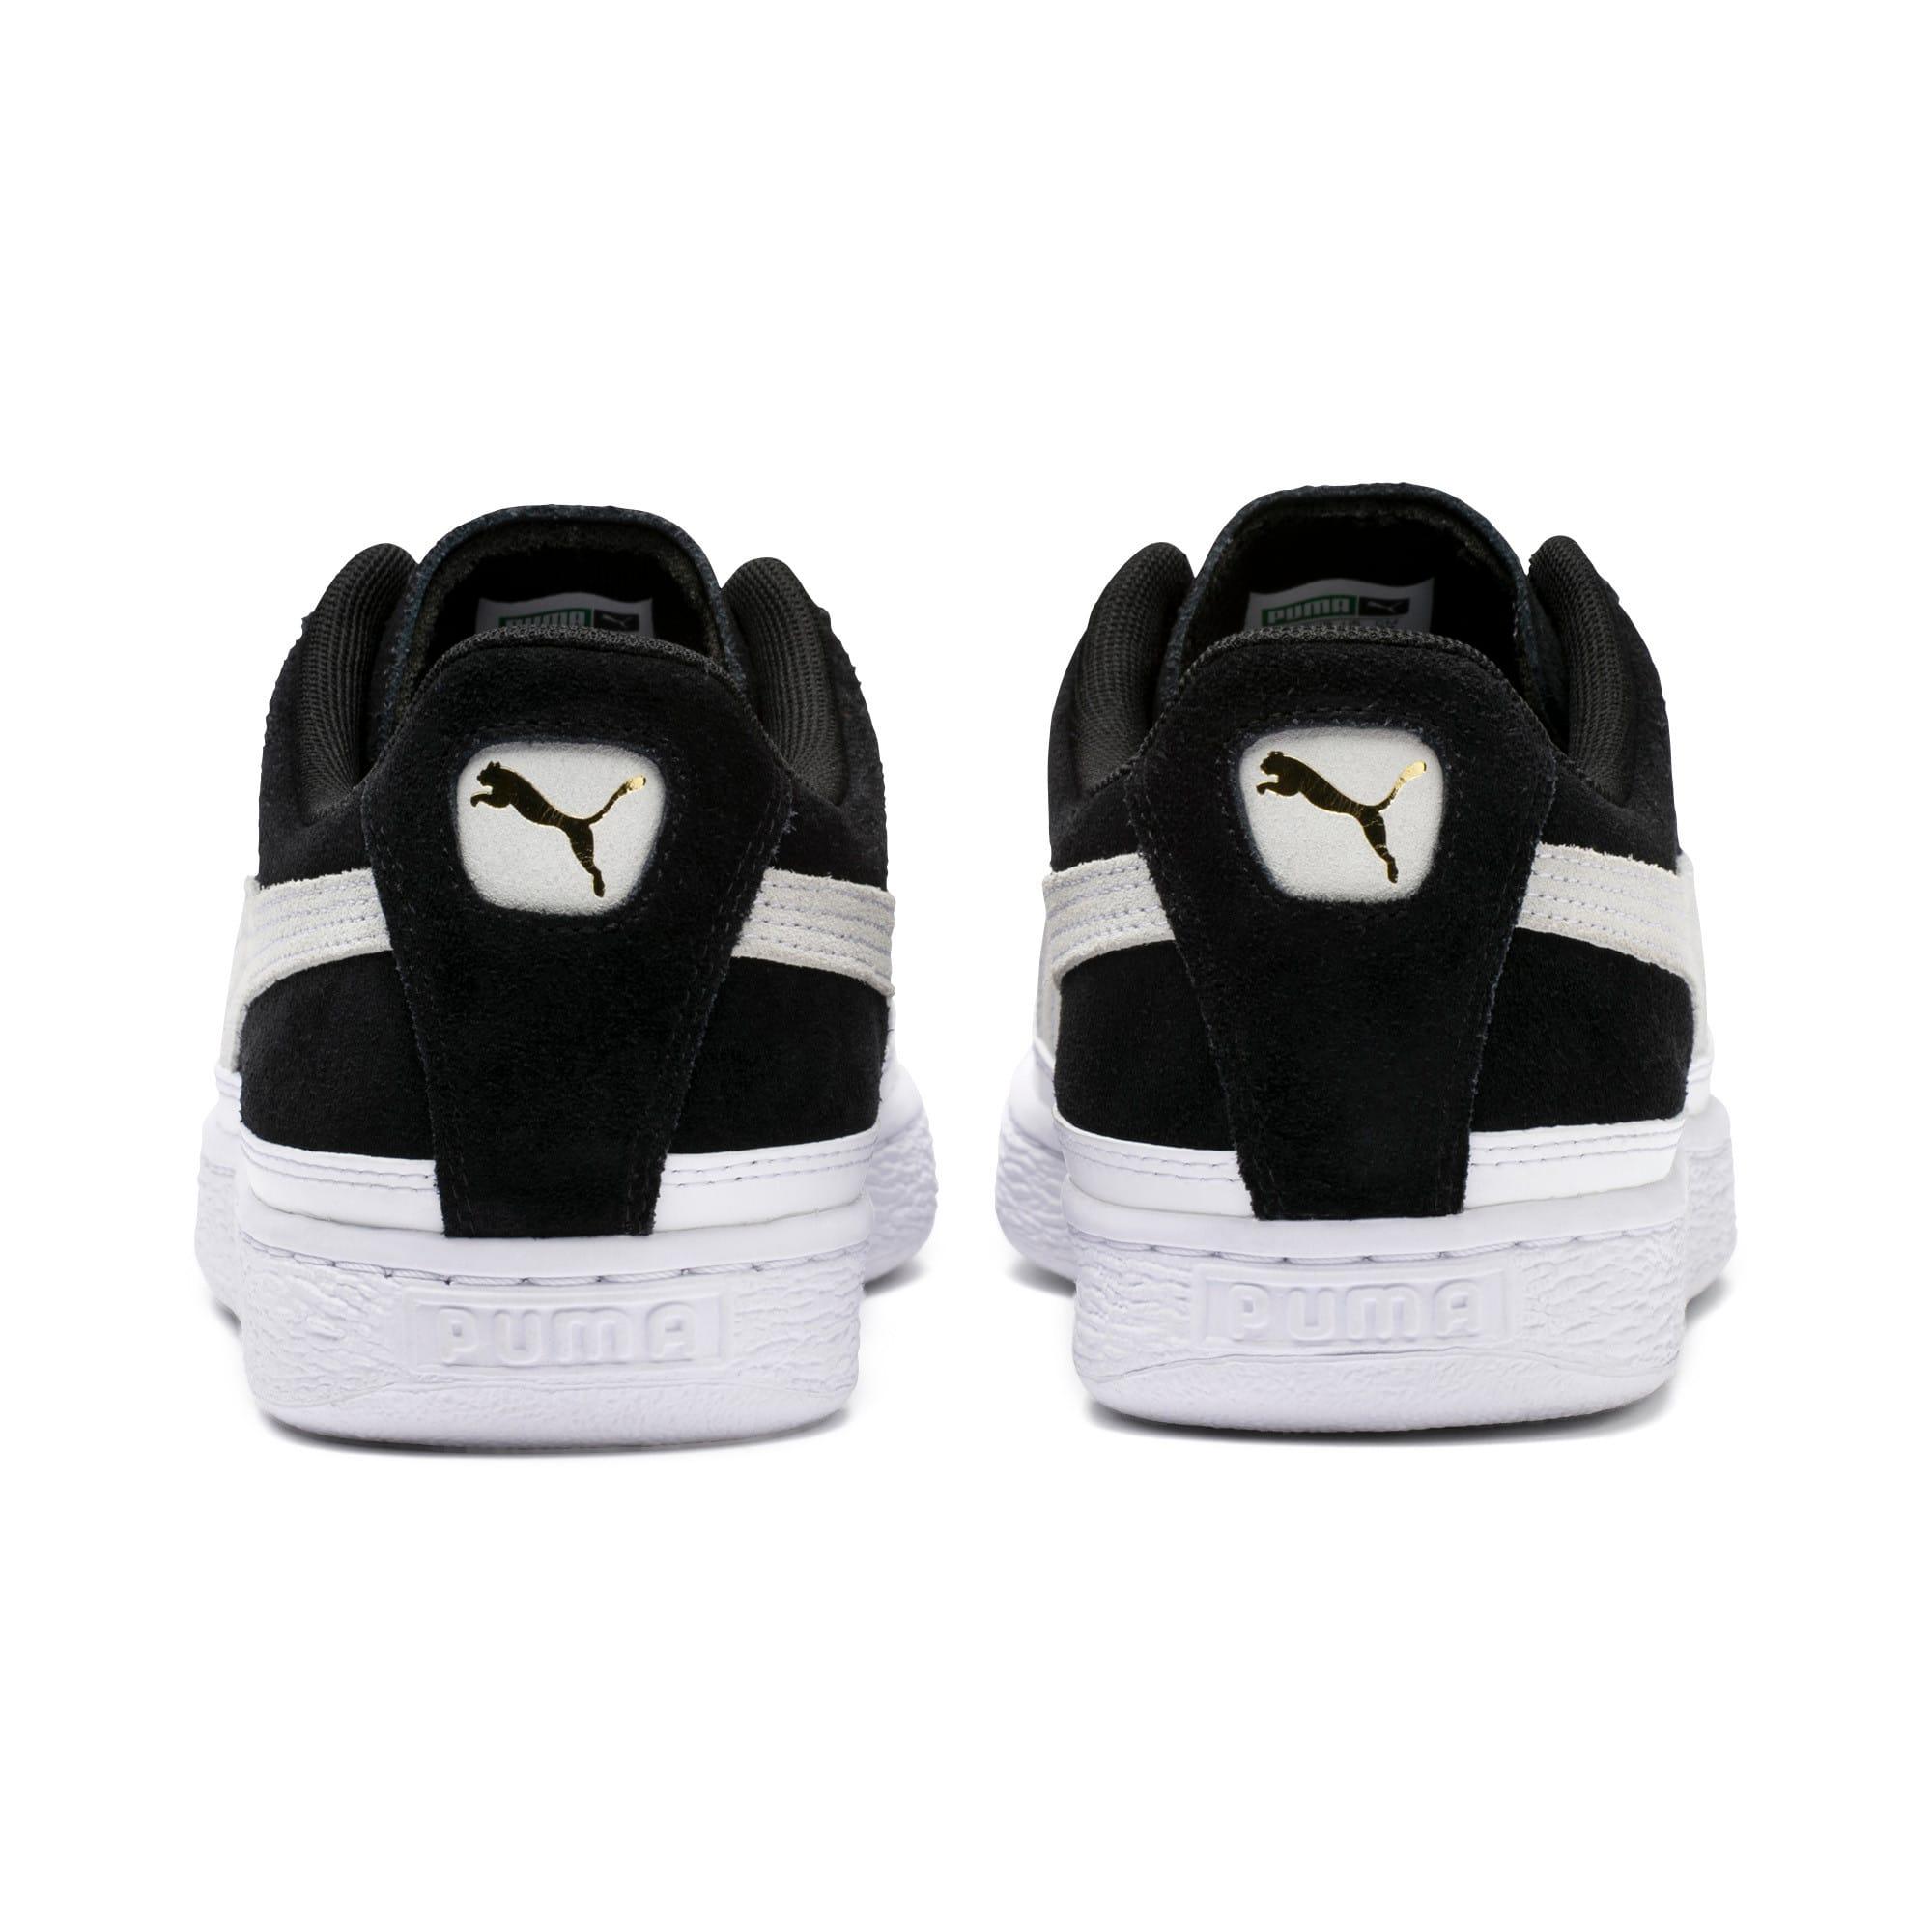 Thumbnail 4 of Suede Skate Sneakers, Puma Black-Puma White, medium